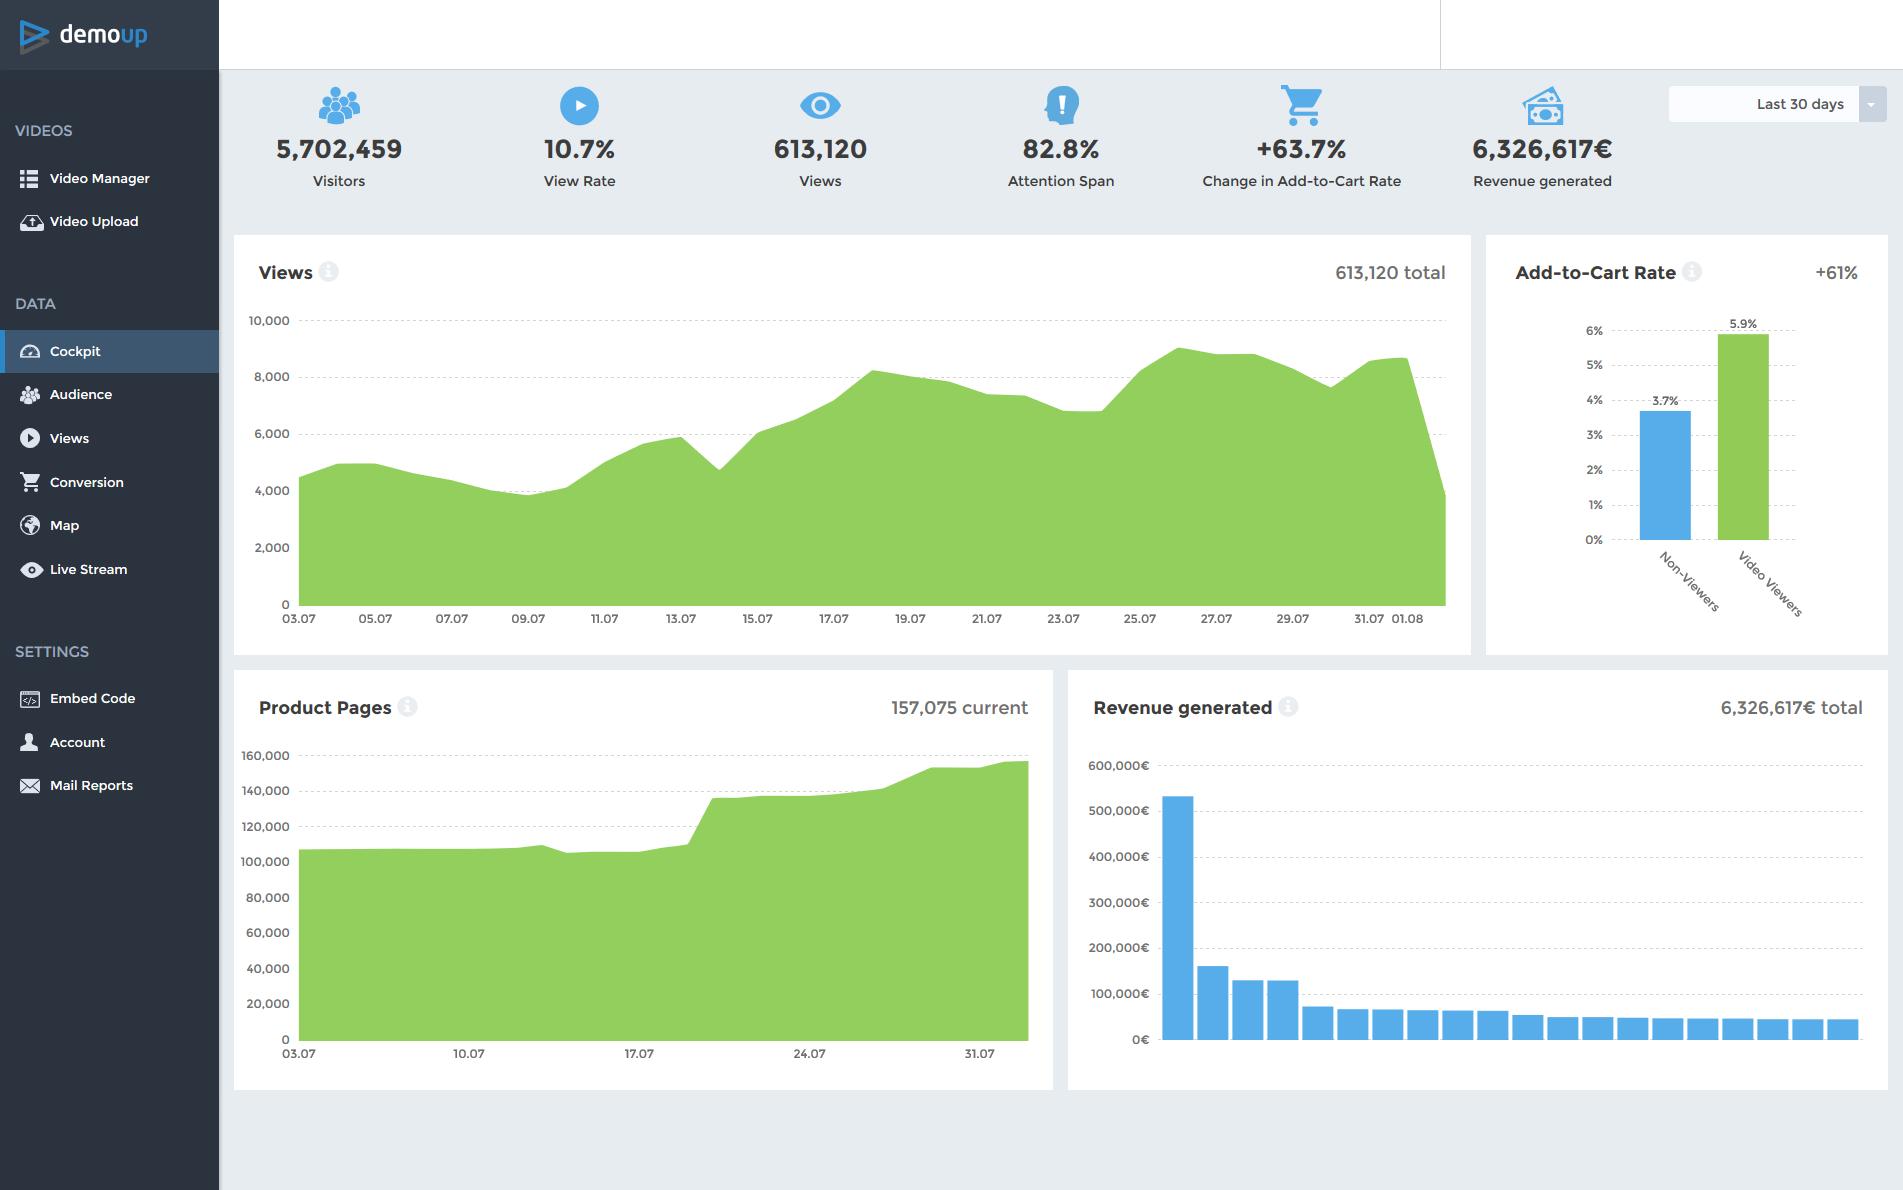 DemoUp Demo - DemoUp Analytics